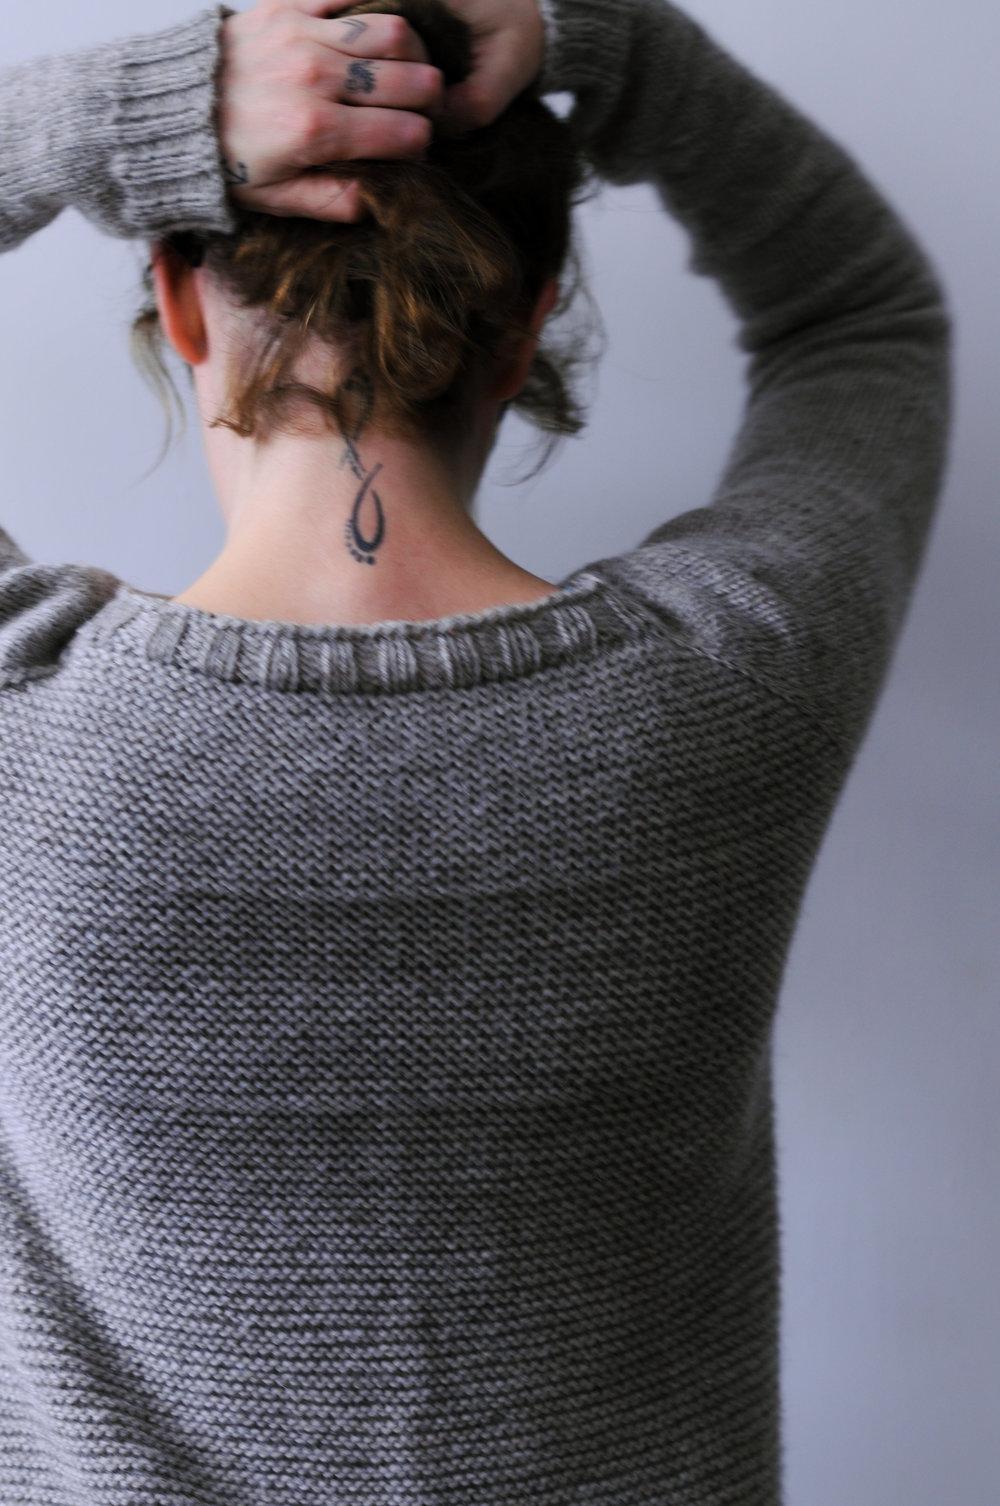 24367-handknitsweaterhandknitsweater.jpg